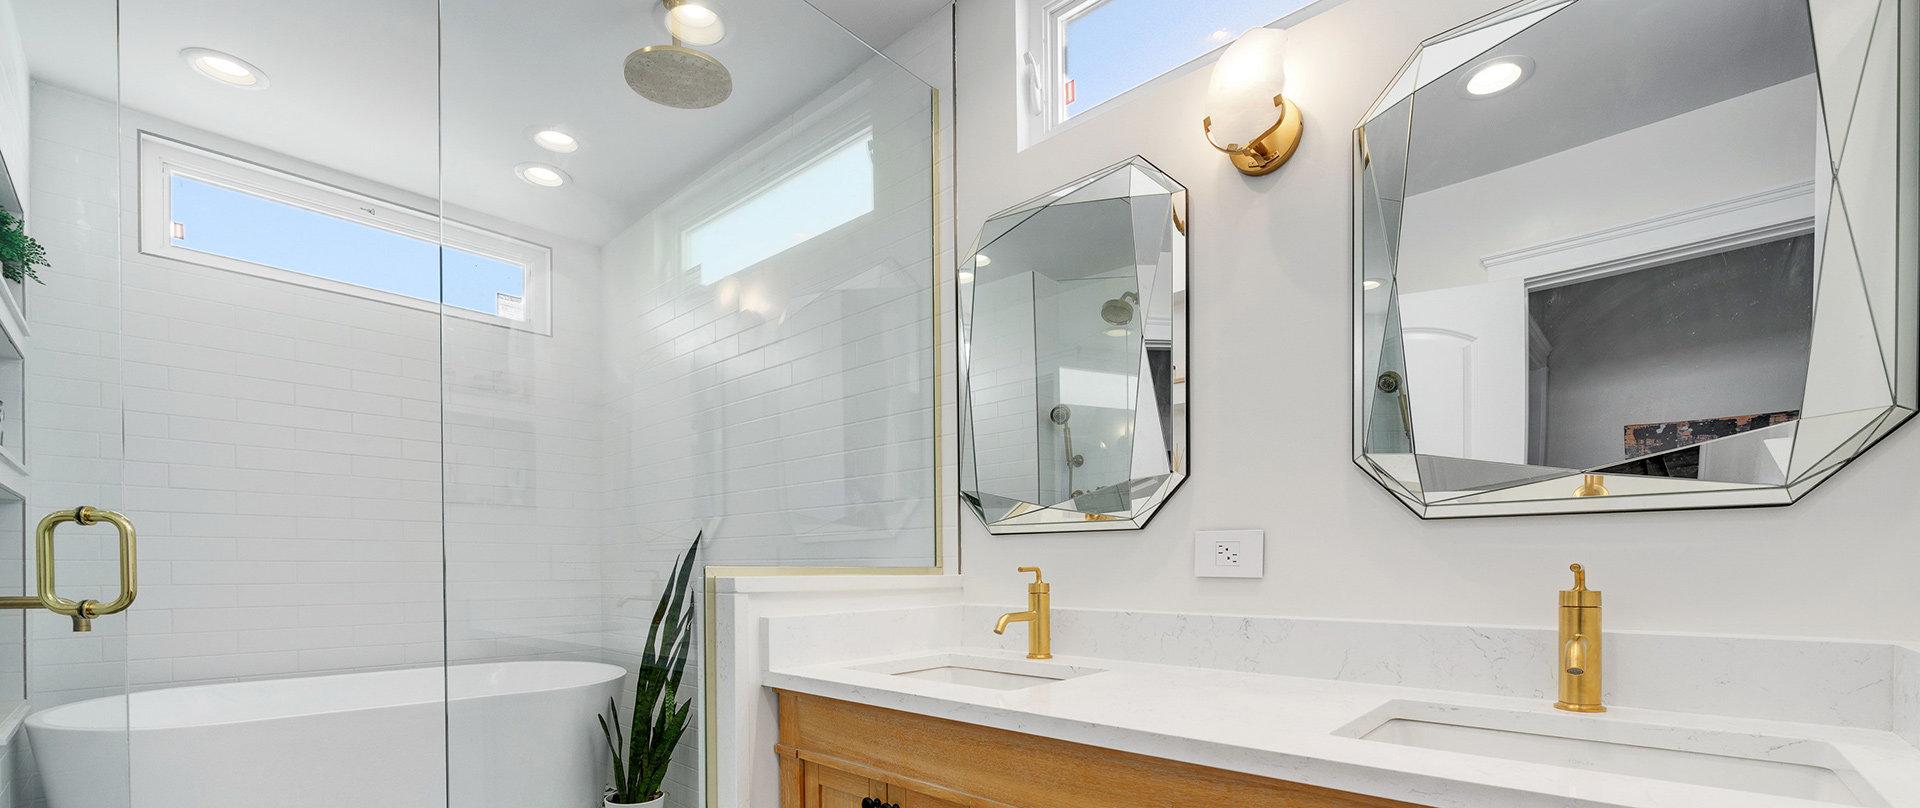 Logan Square Master Bathroom Addition